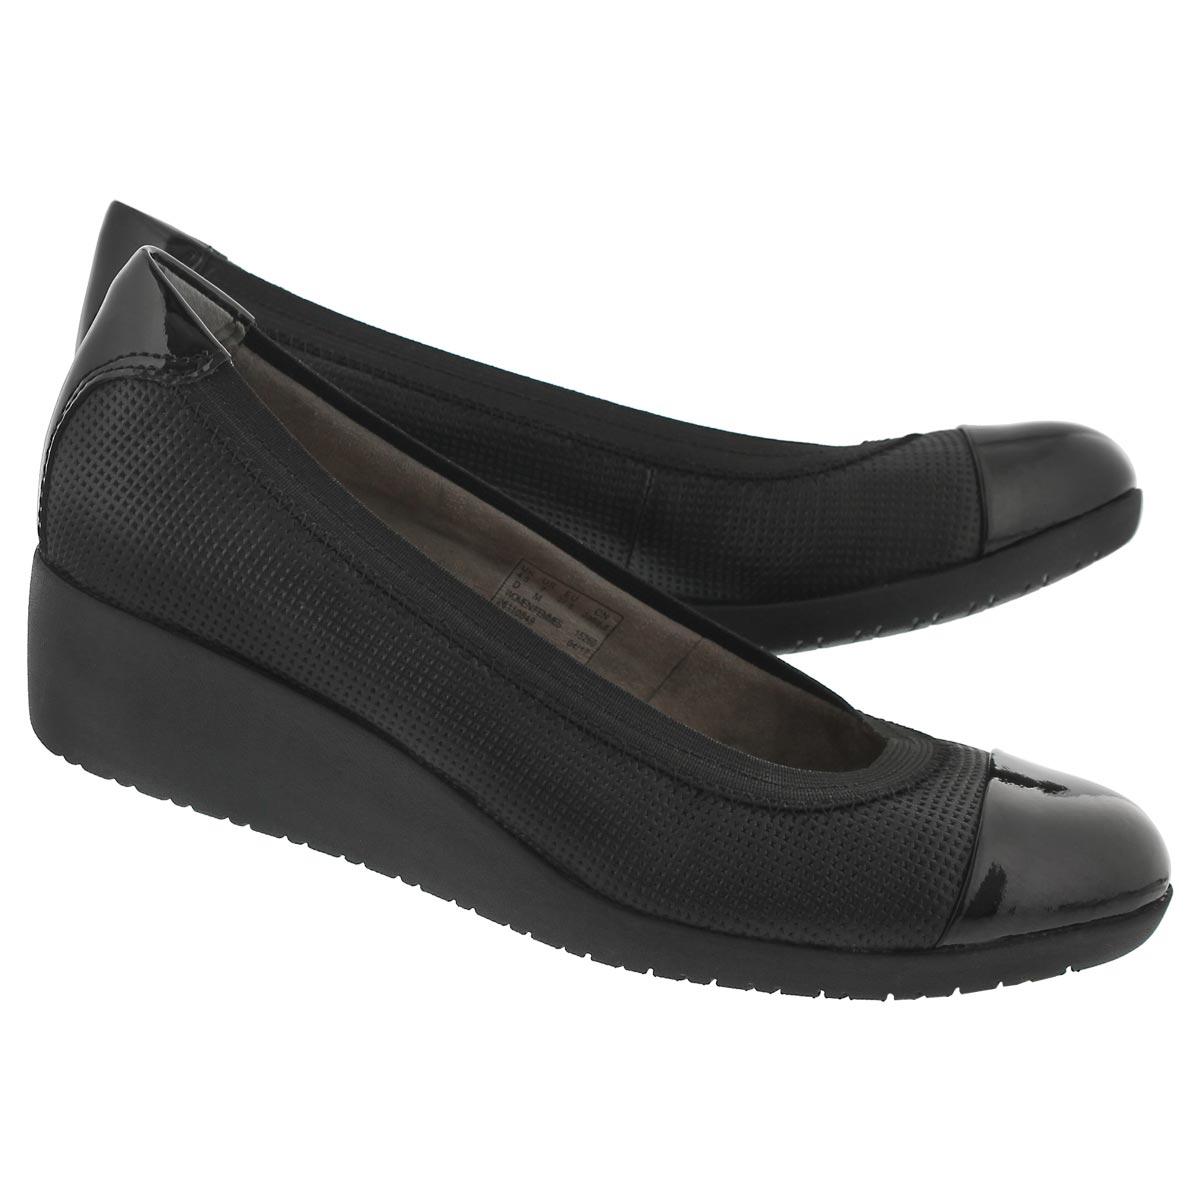 Lds Petula Sadie black slip on wedge